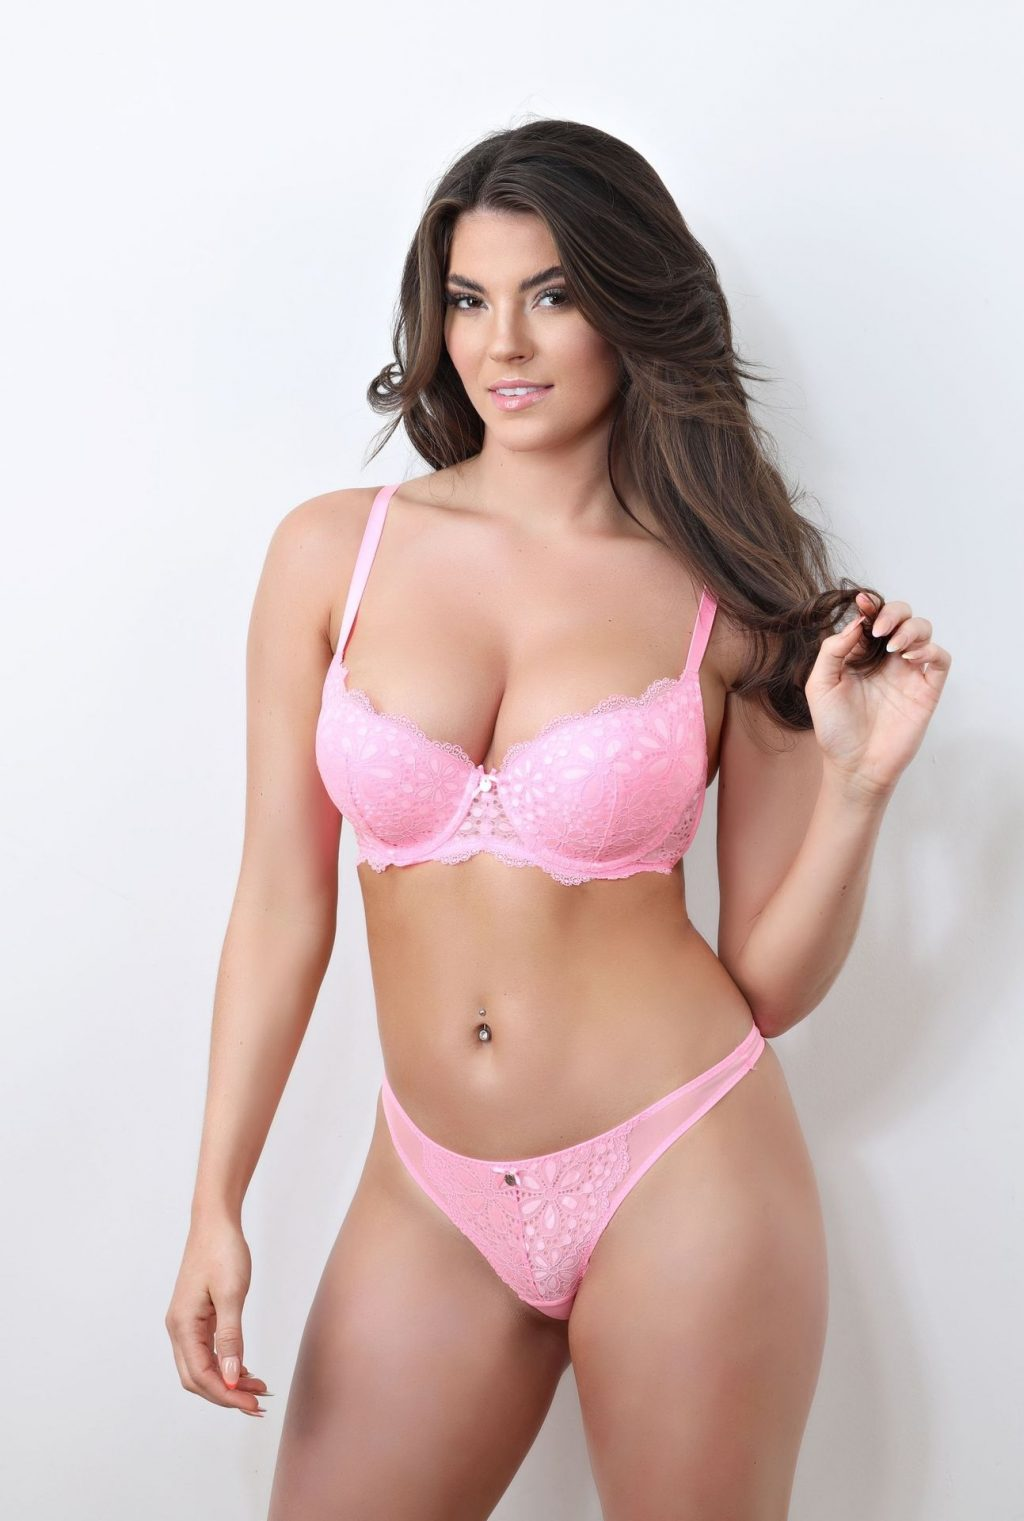 Rebecca Gormley is Seen on Her Sexy Photoshoot (10 Photos)